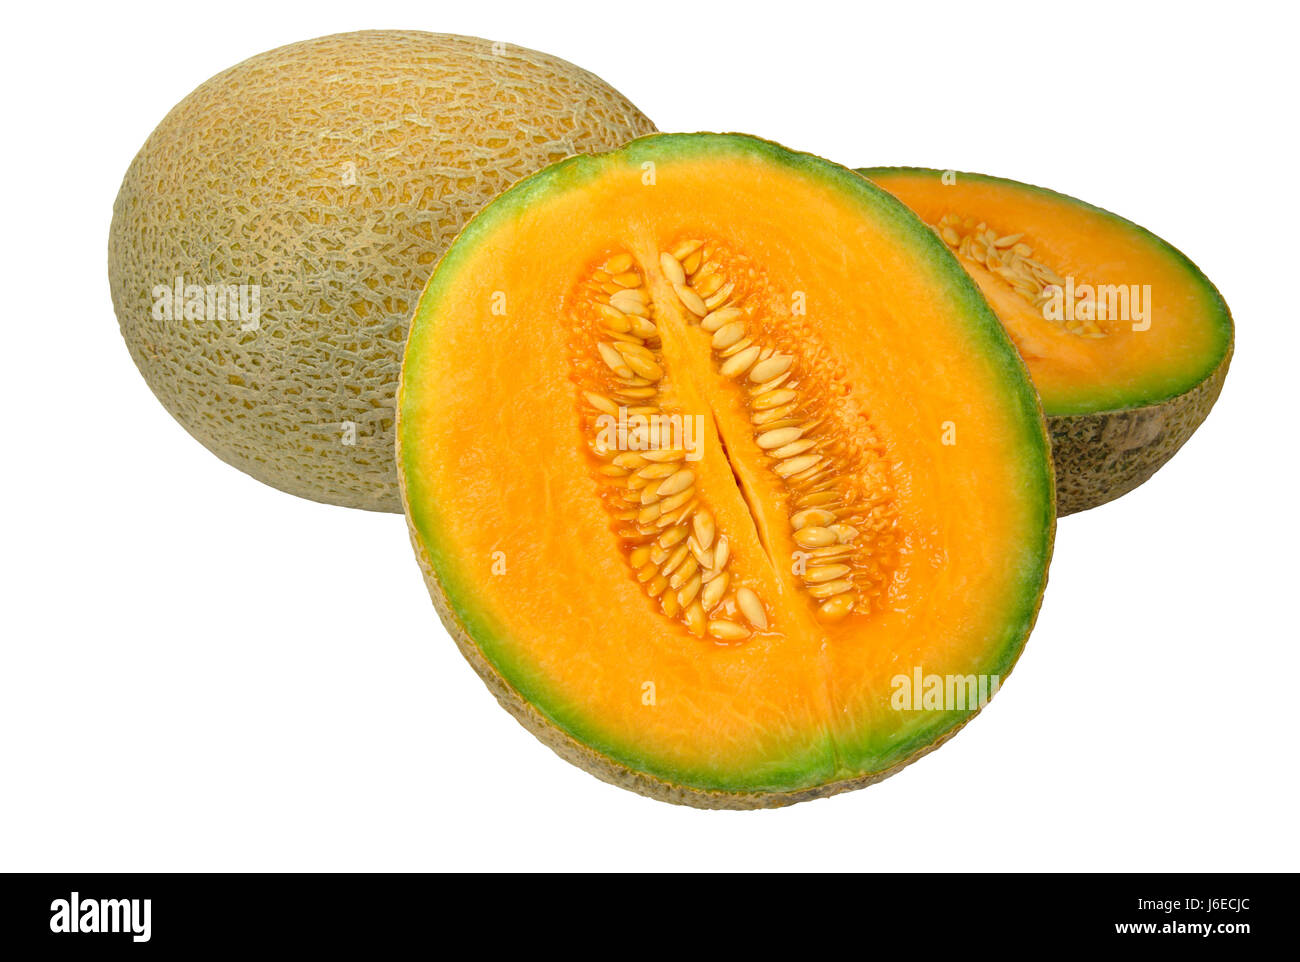 food aliment health isolated fruit diet melon half fresh orange food aliment Stock Photo